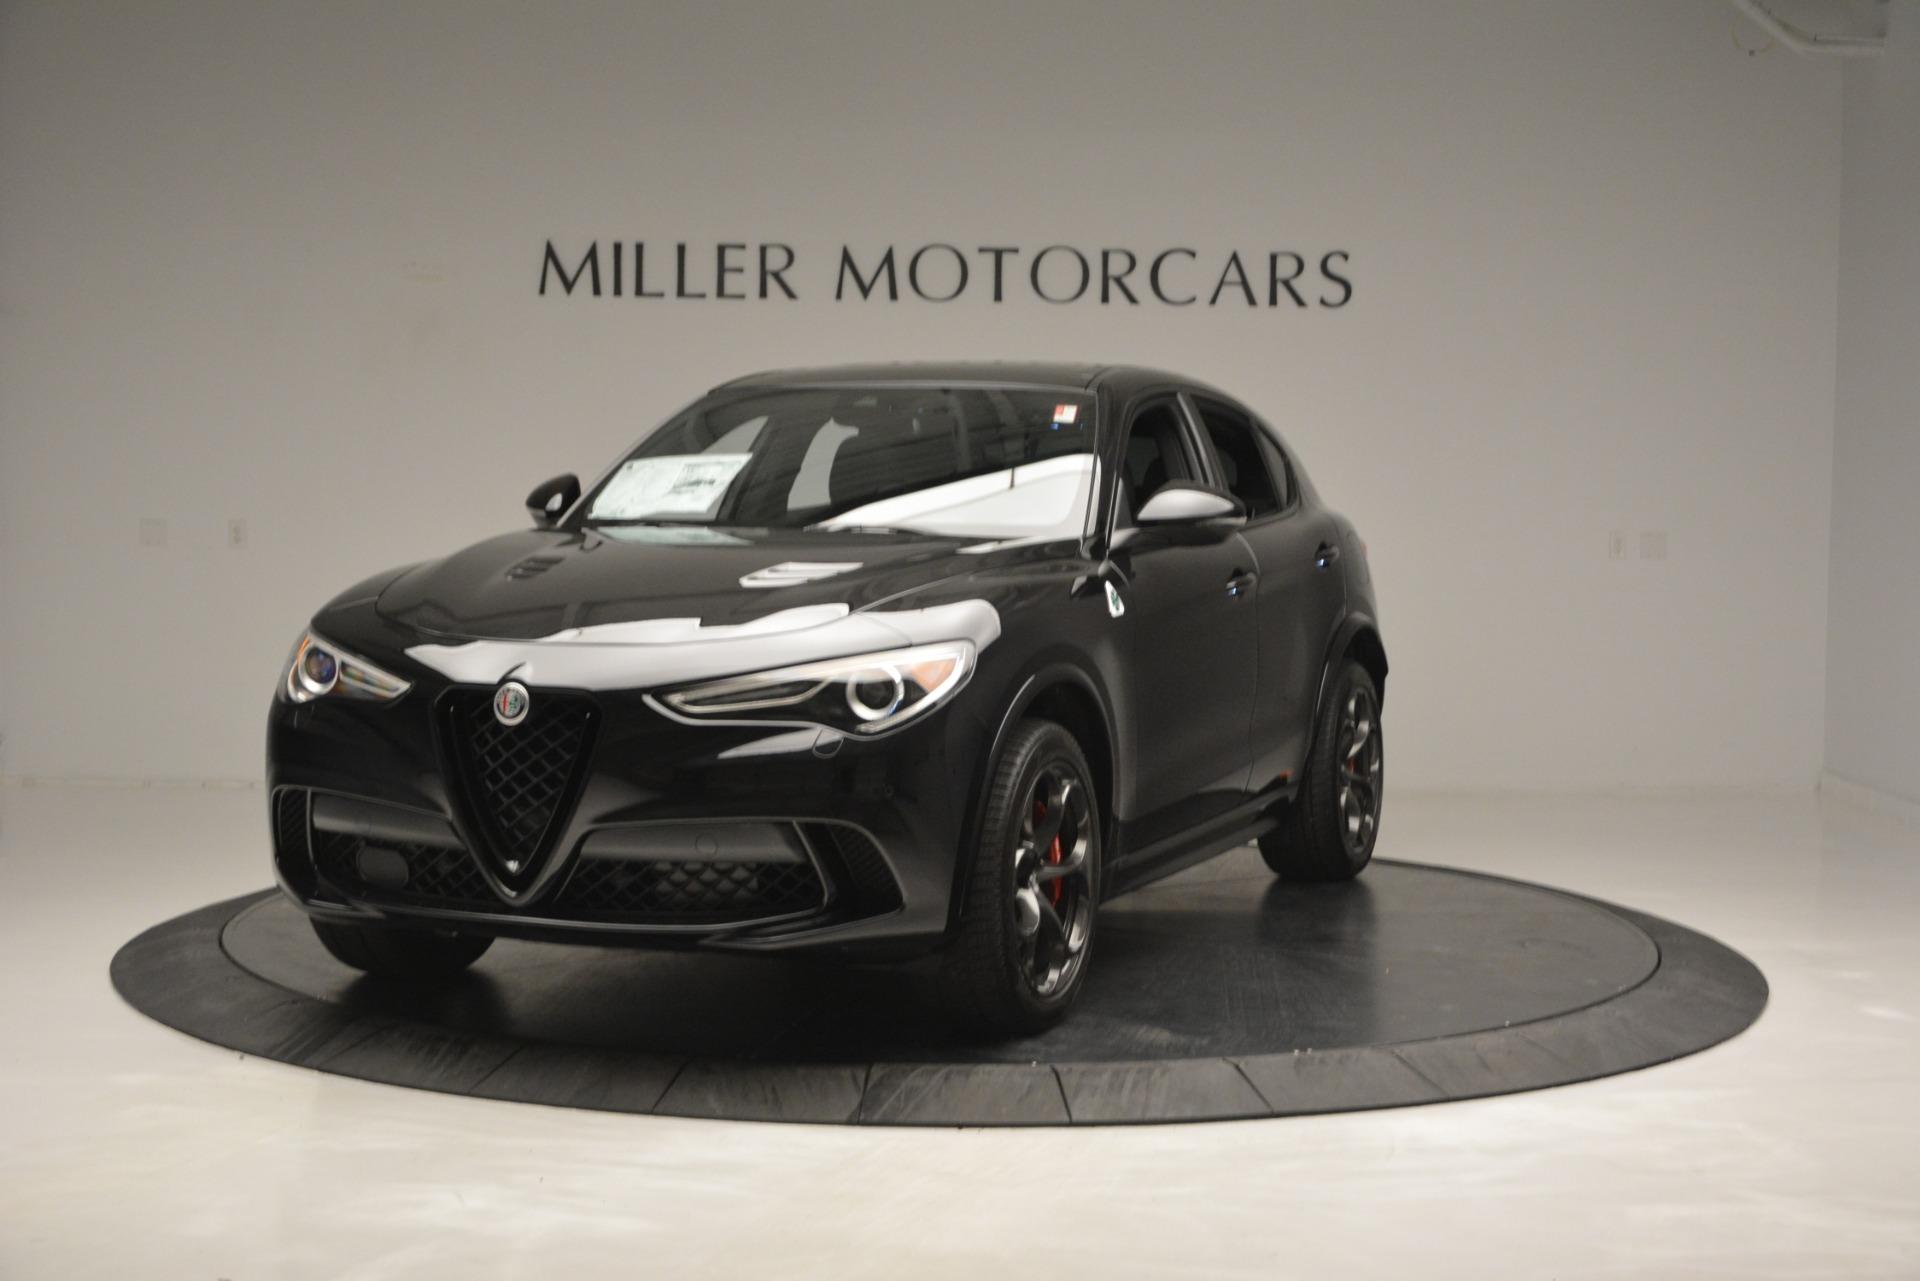 New 2018 Alfa Romeo Stelvio Quadrifoglio for sale Sold at Maserati of Westport in Westport CT 06880 1